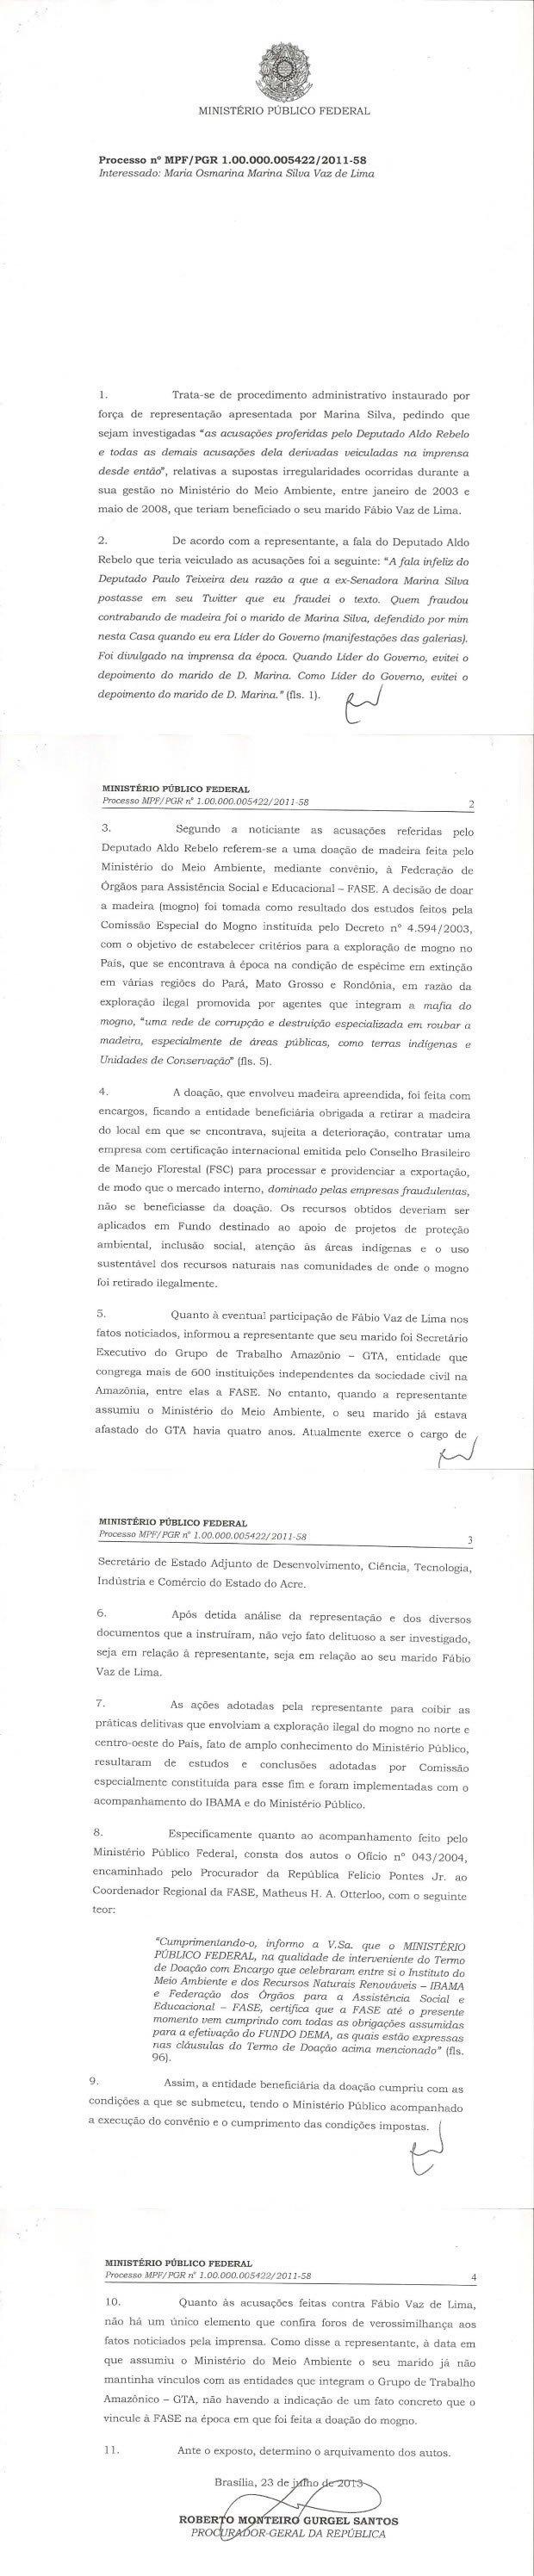 Processo-Fábio-Vaz